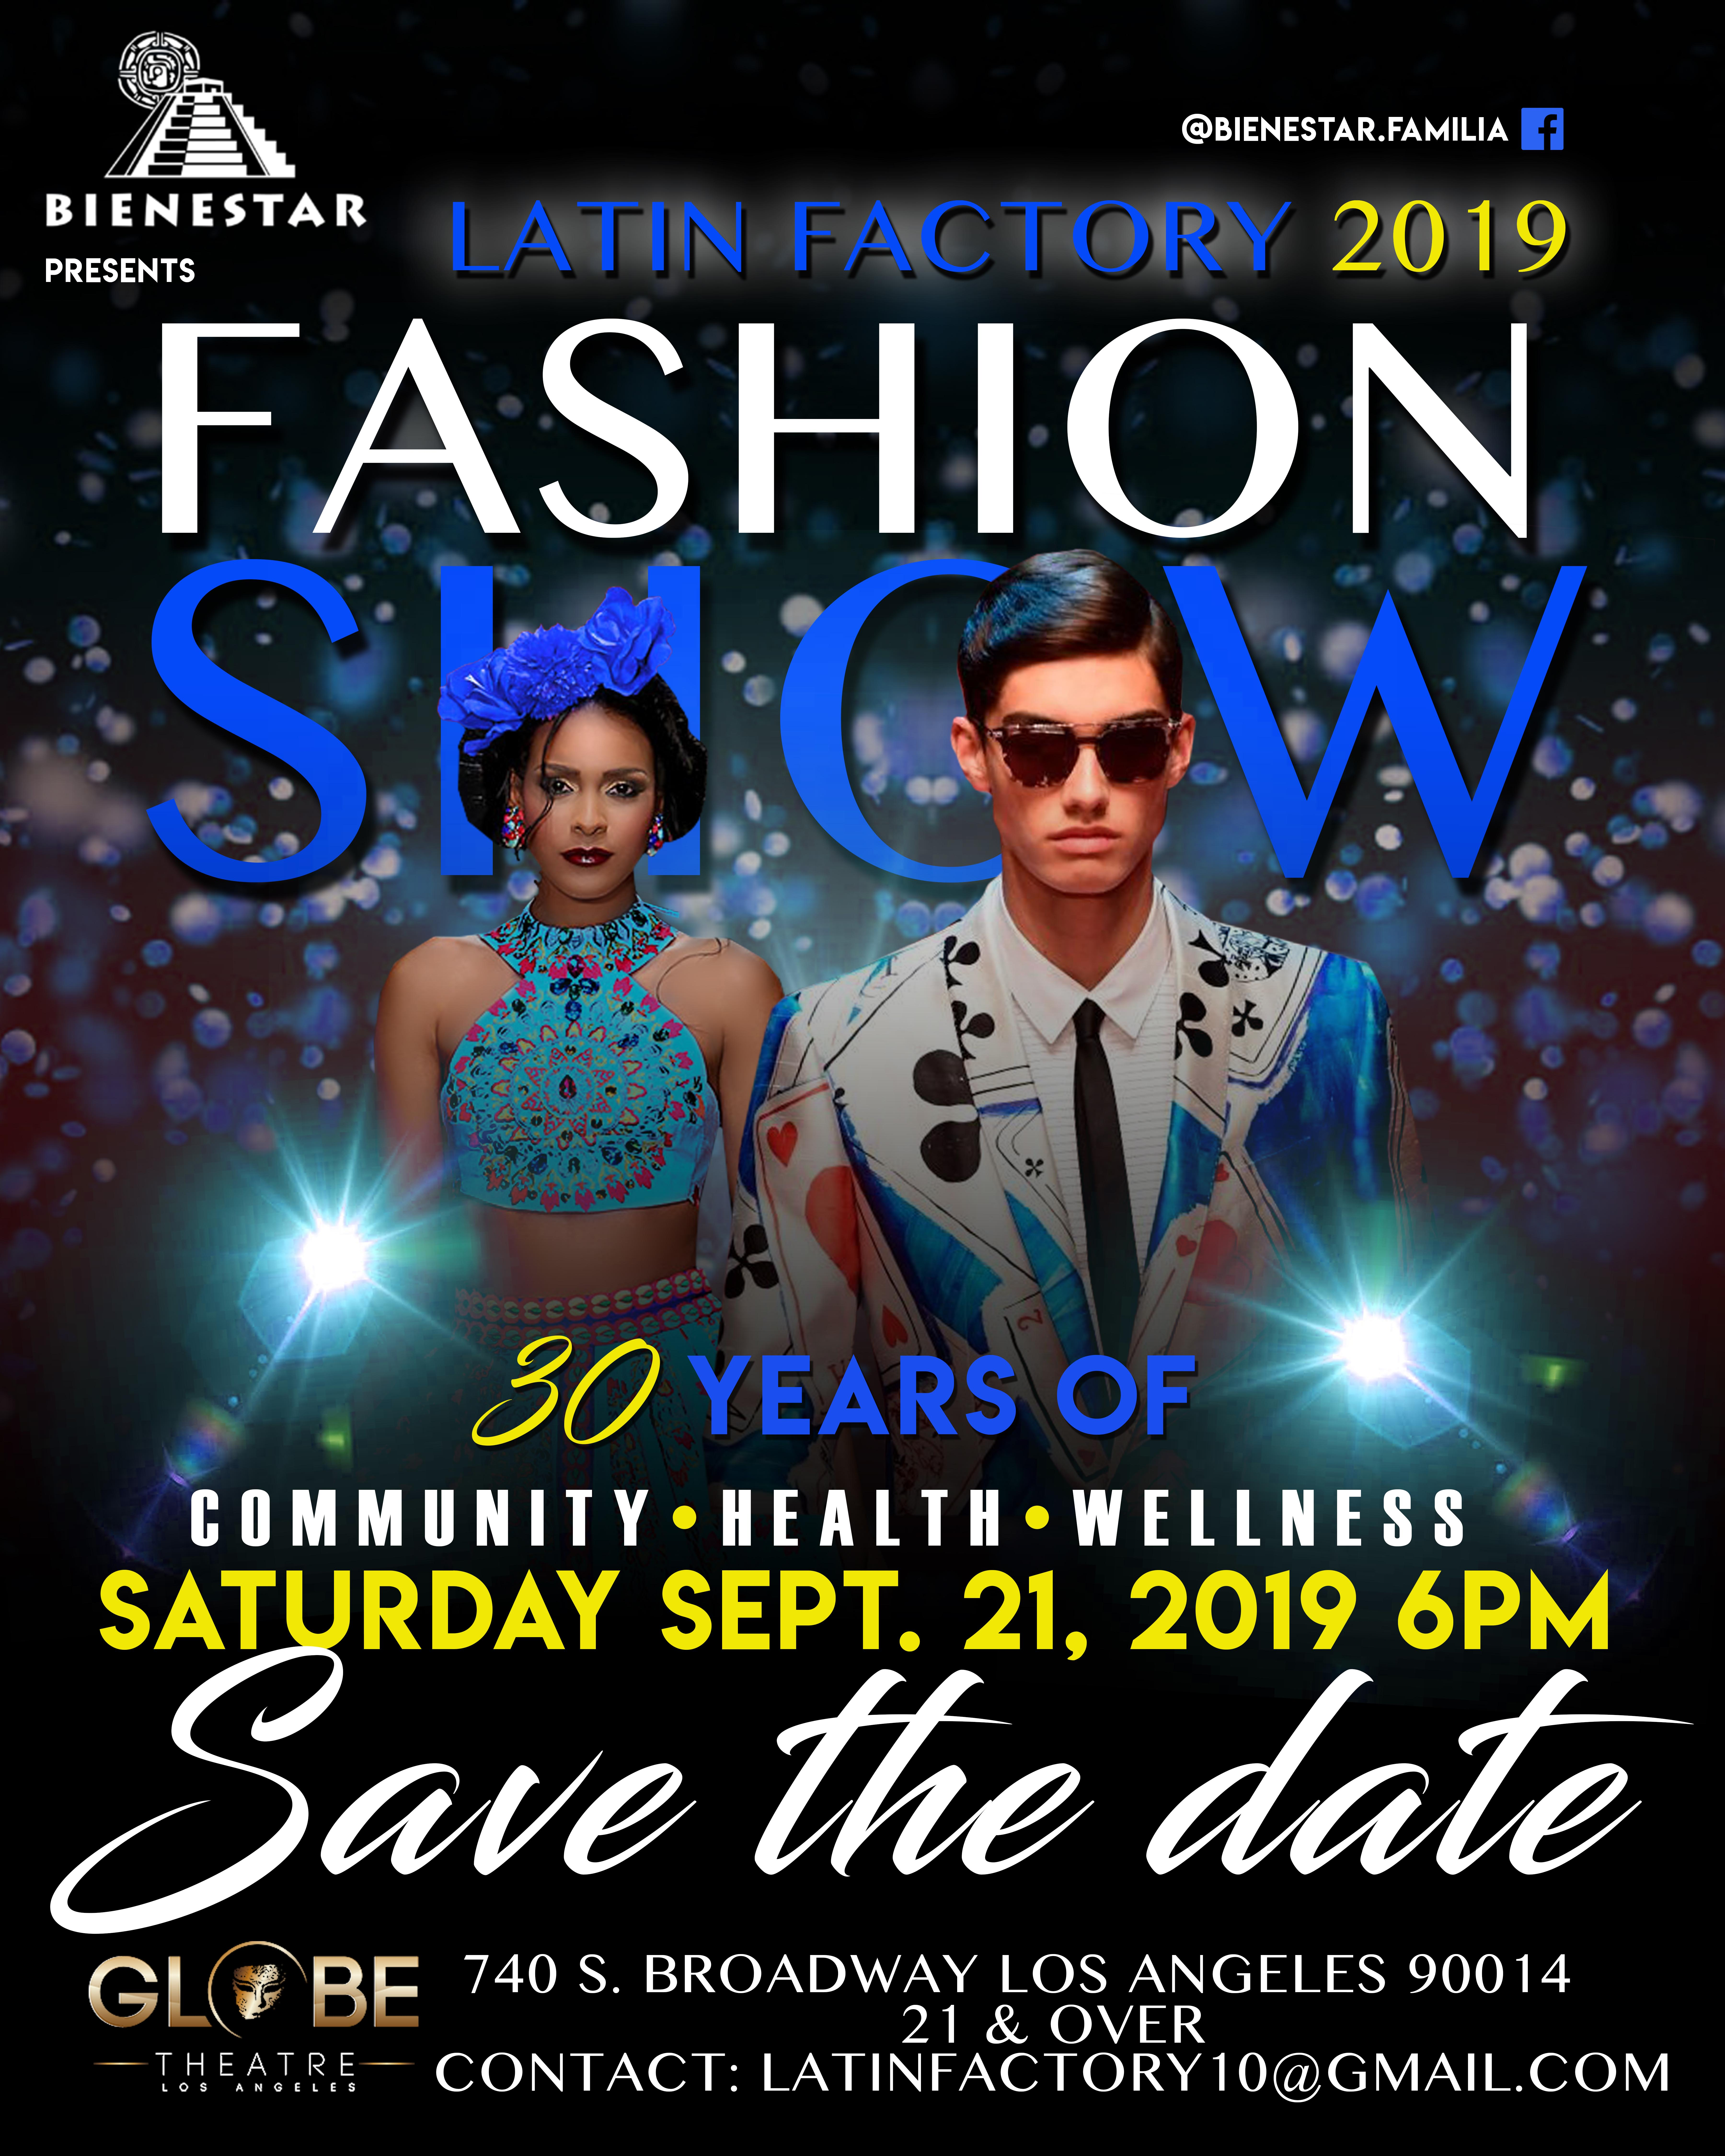 Bienestar_Fashion_show_2019_SAVE_THE_DATE.jpg